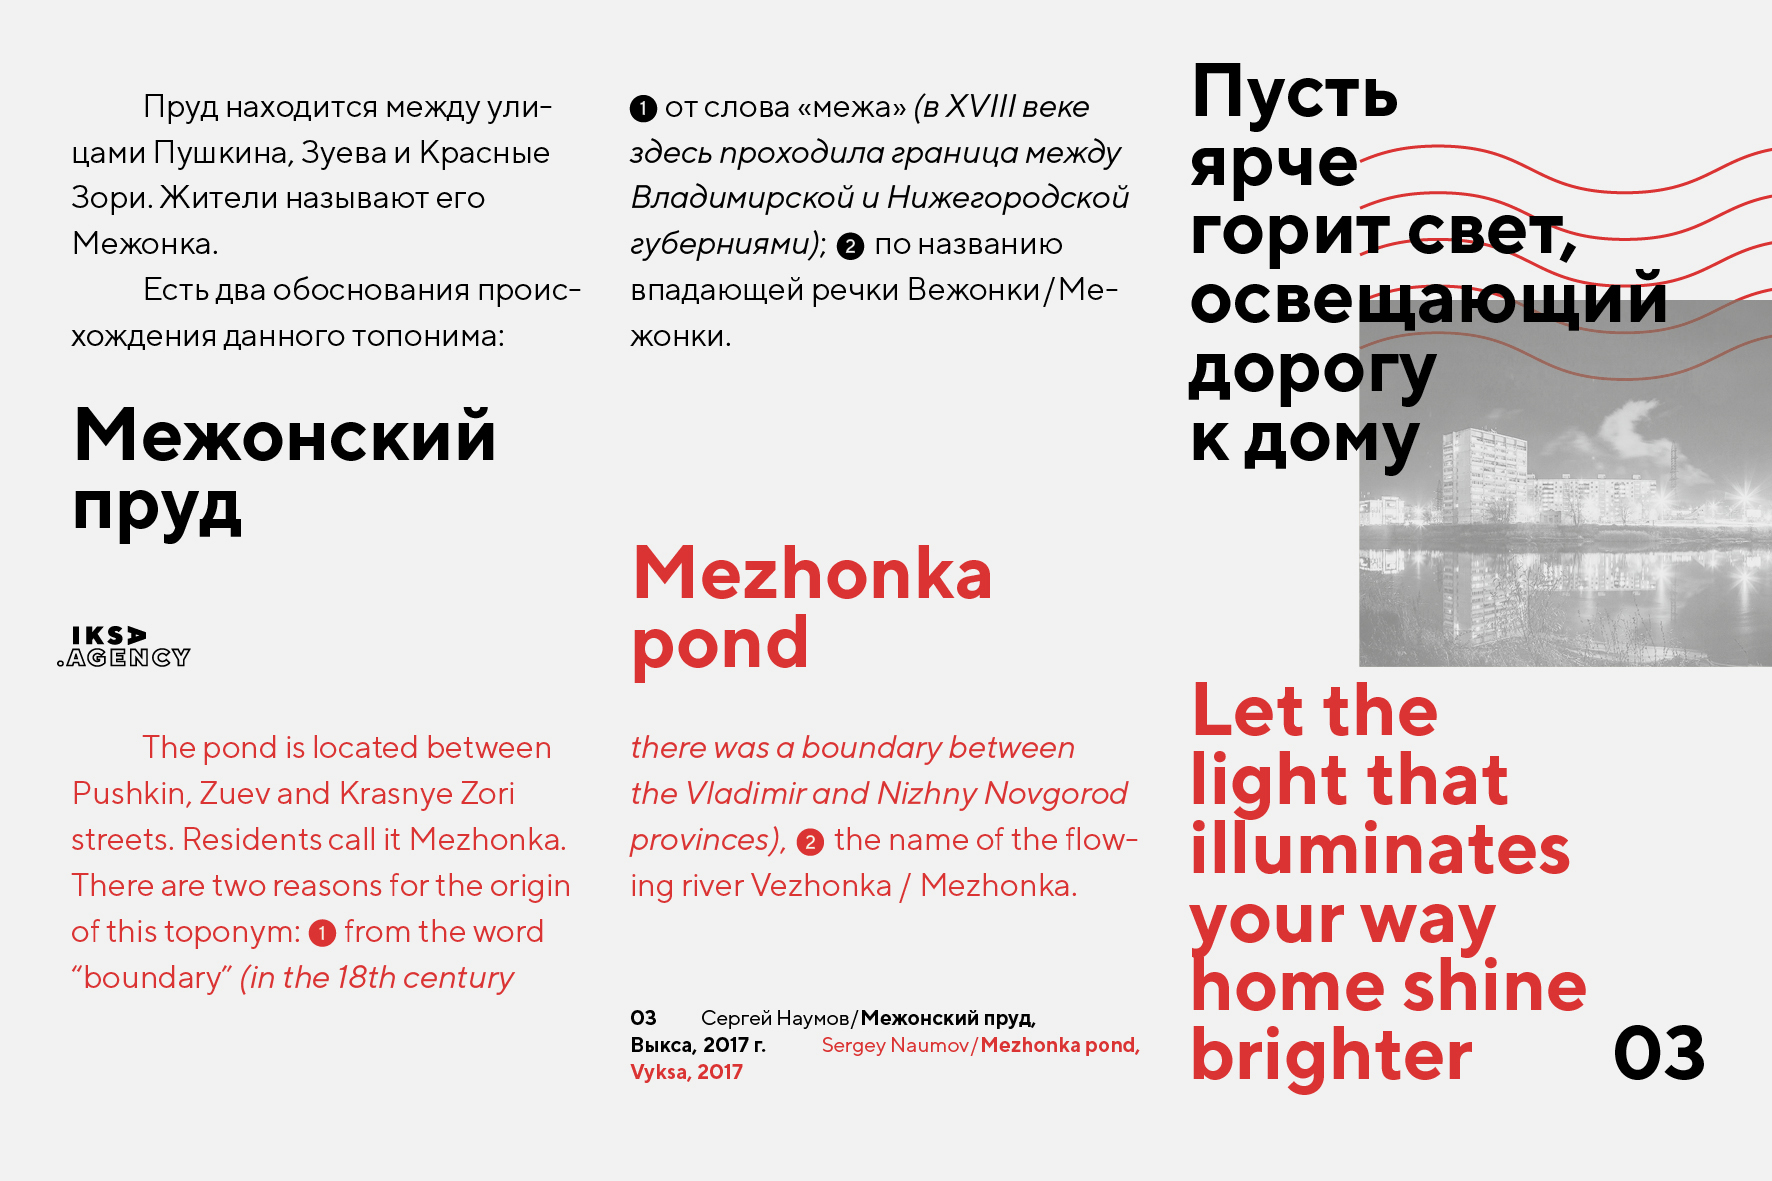 otk_vyksa_18_EDITBLUE_print6